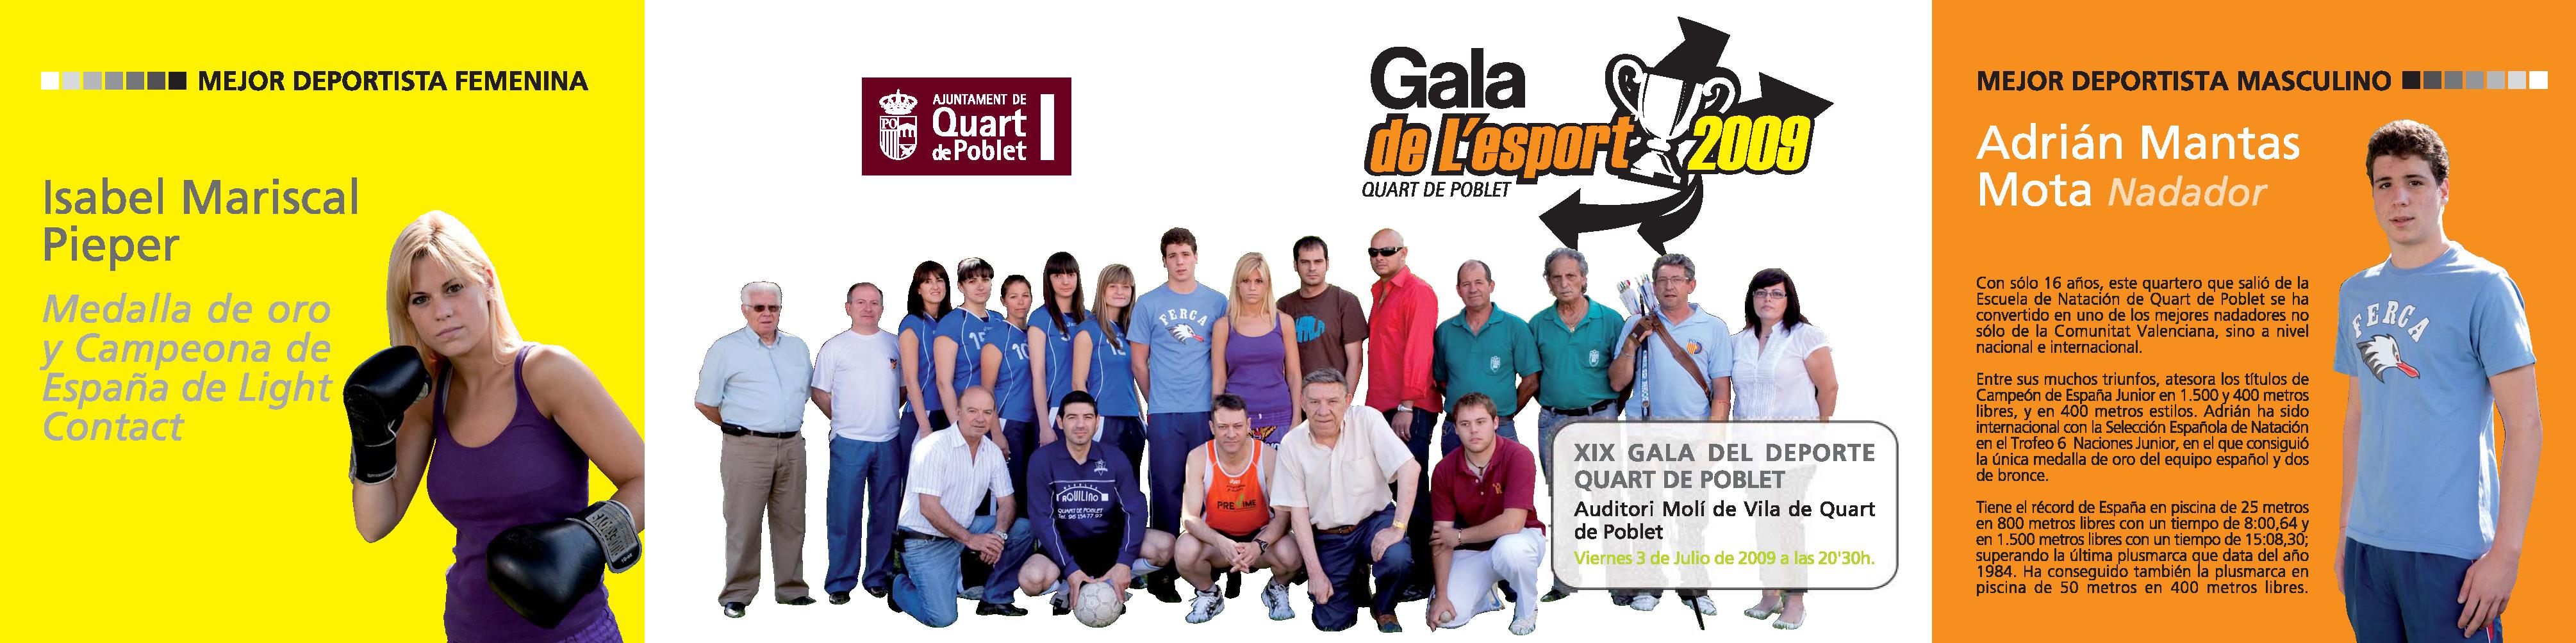 gala esport31